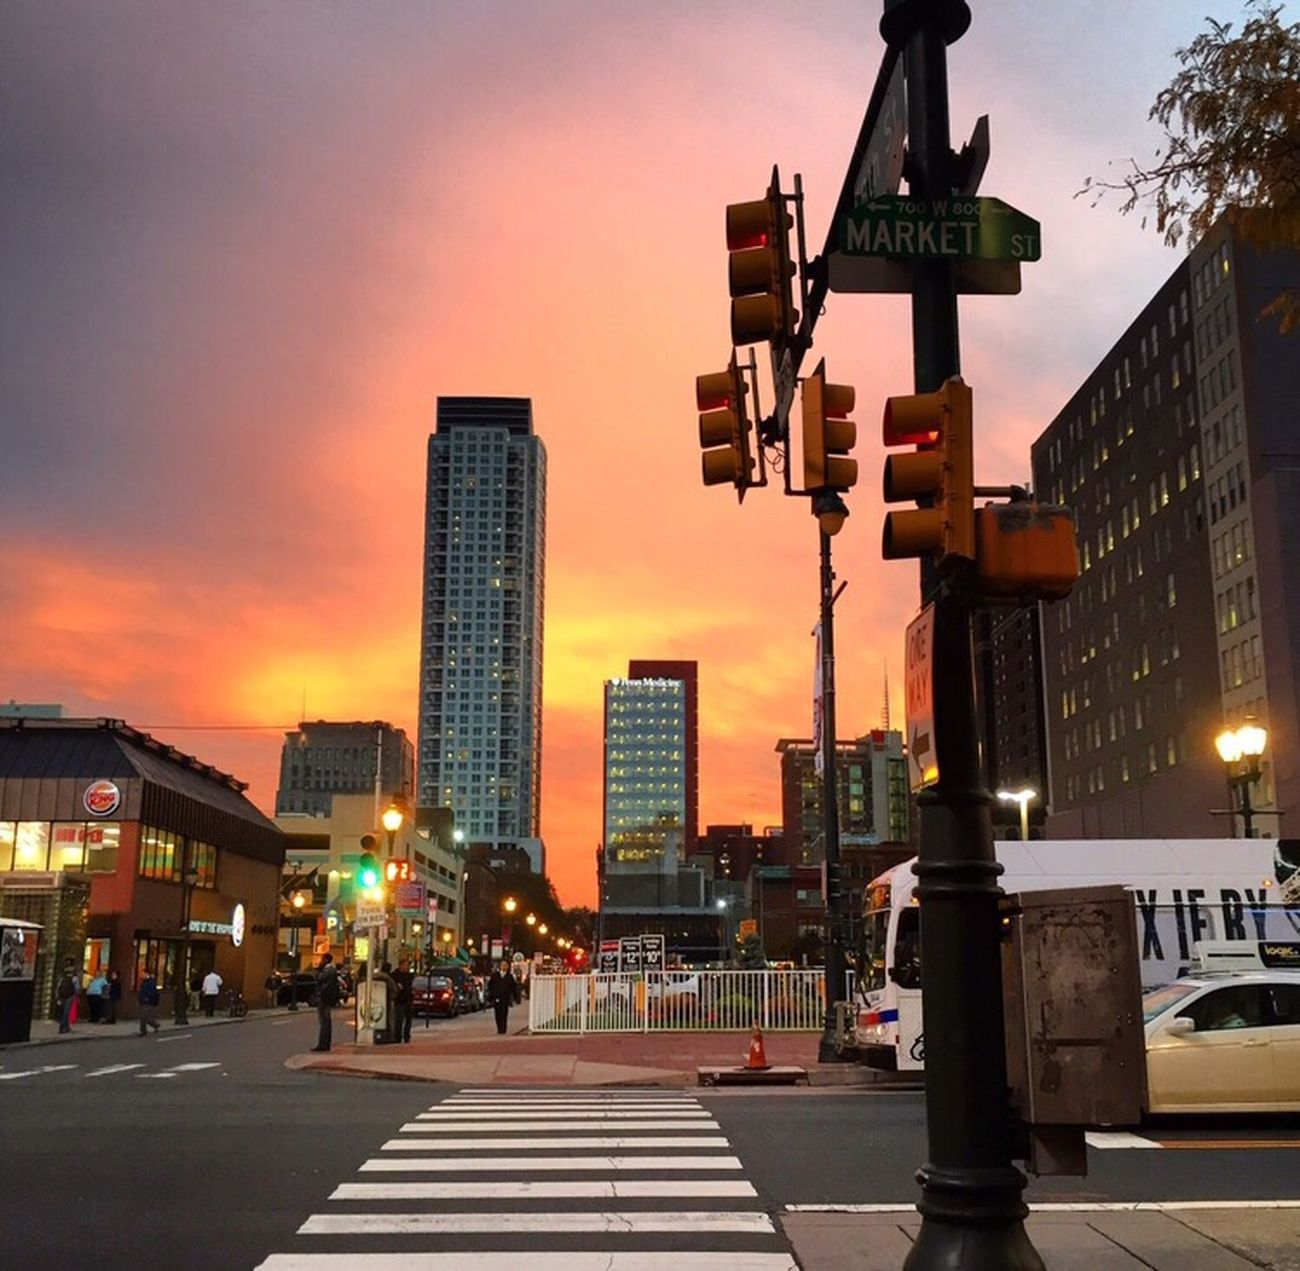 2015 Center City Philadelphia Centercity Marketstreet City Cityscapes Sunset Skyscraper